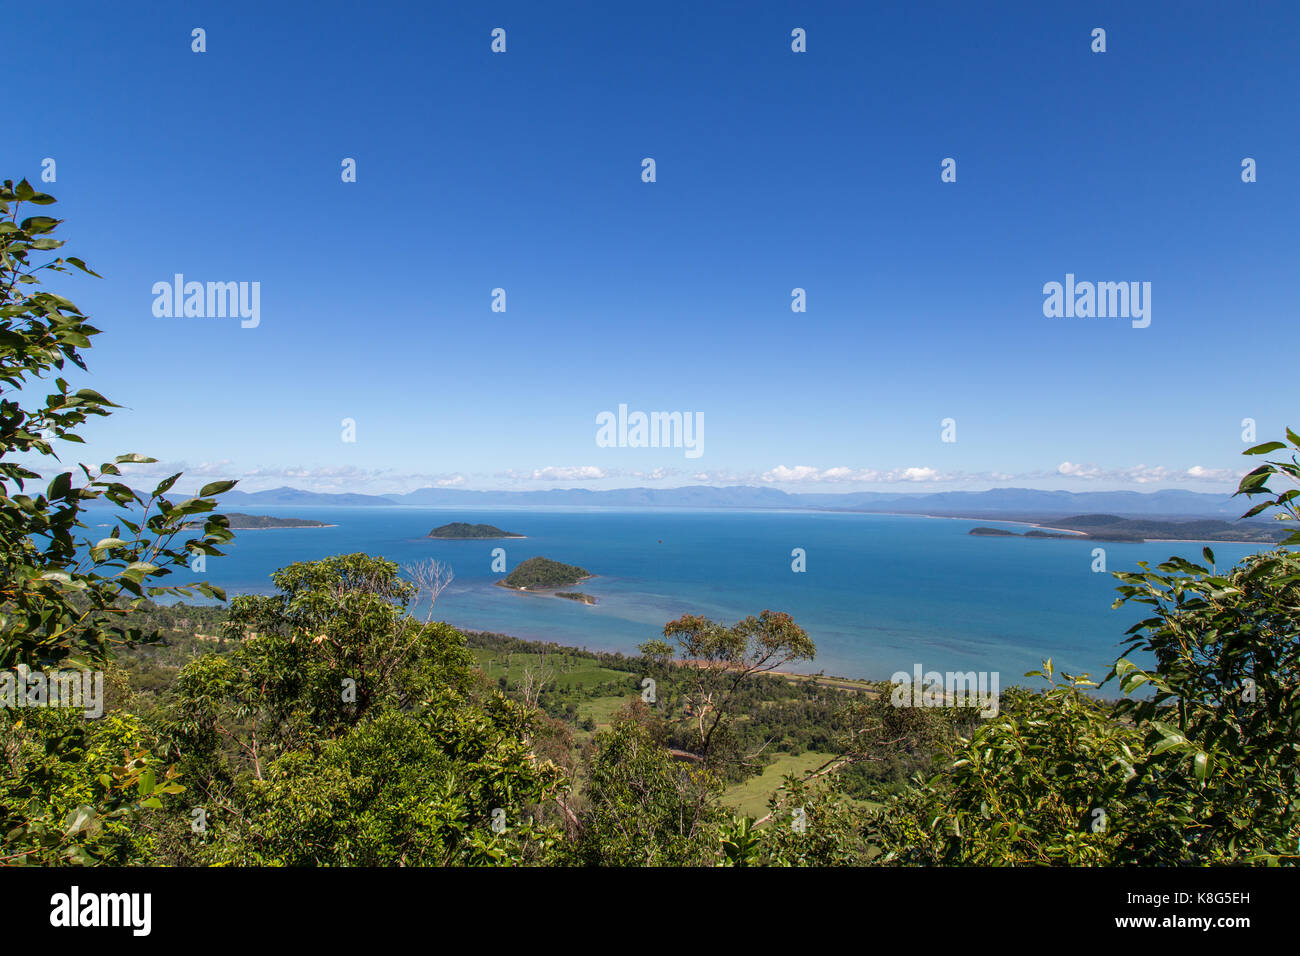 Dunk Island Holidays: Dunk Island Queensland Stock Photos & Dunk Island